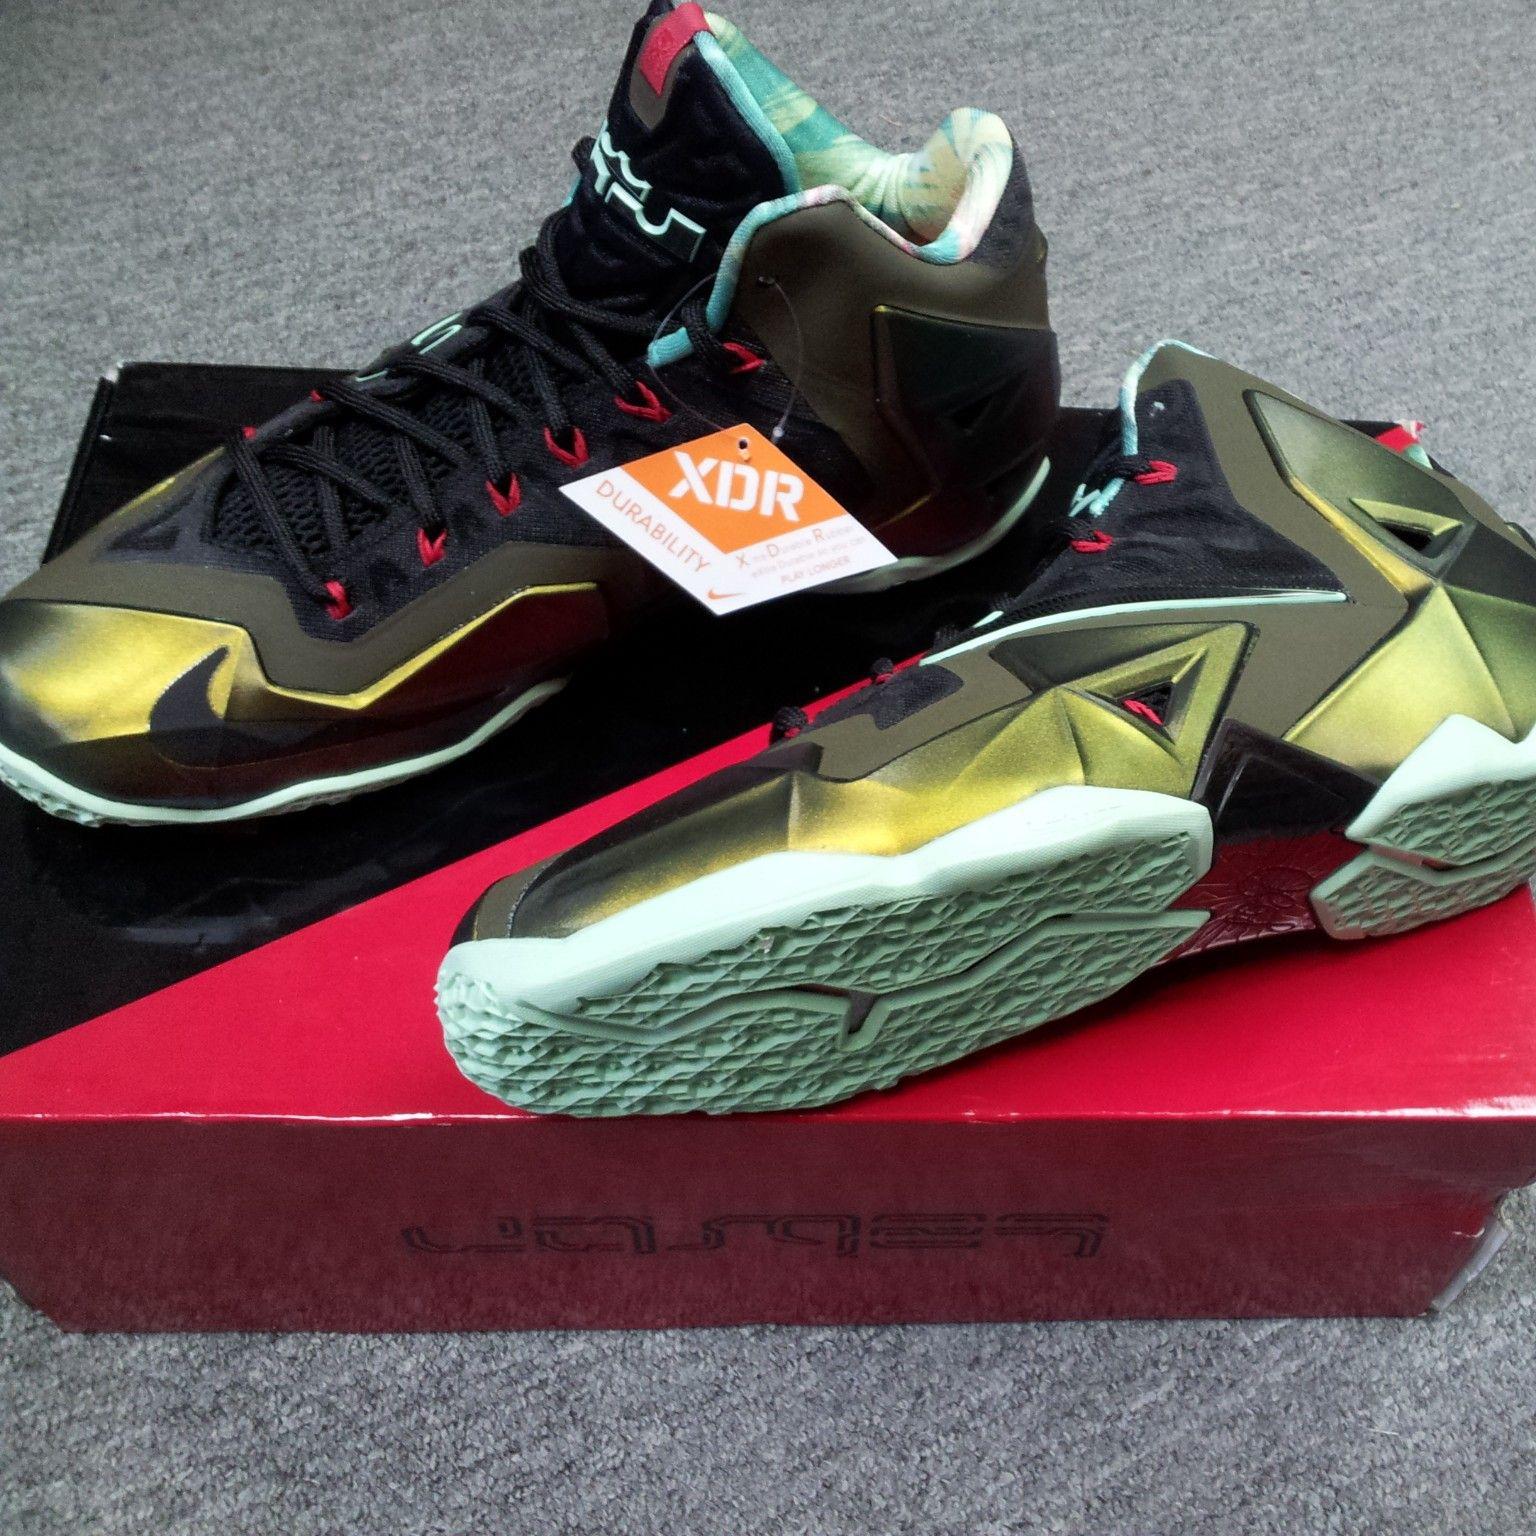 the best attitude a0b1b 573df Nike LeBron 11 King s Pride